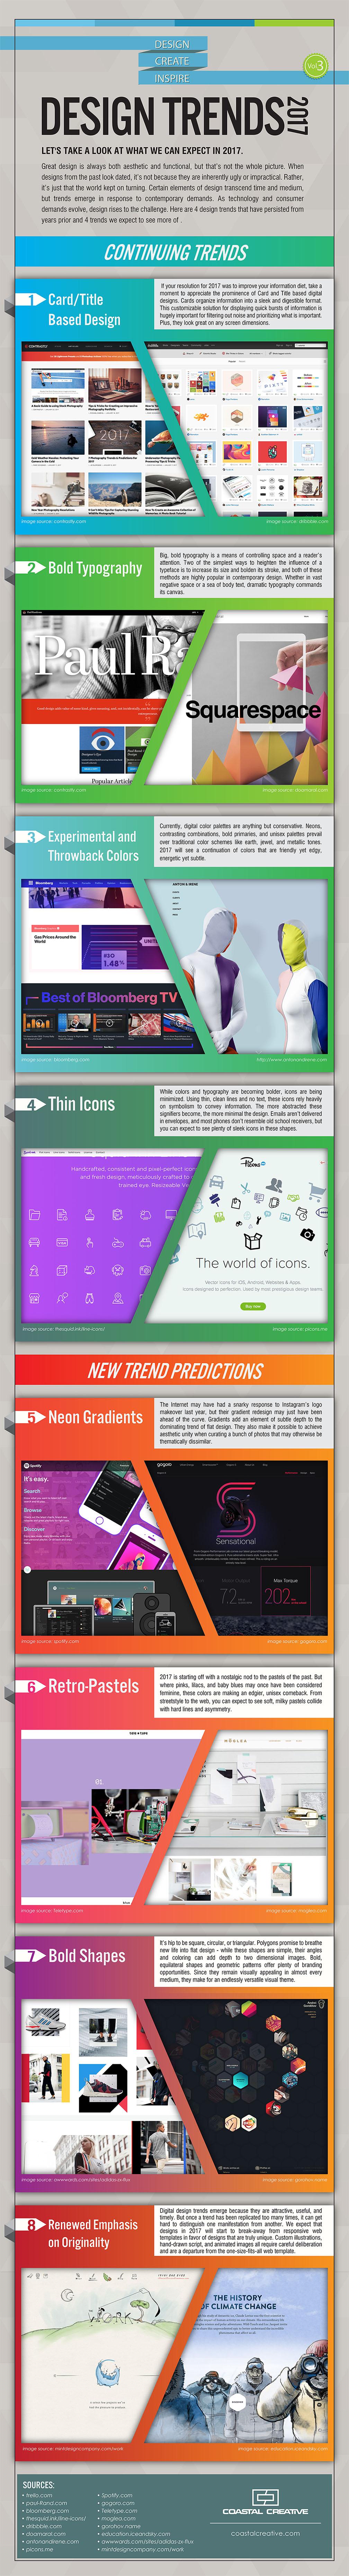 Design_Trends_2017-Infographic-1.jpg